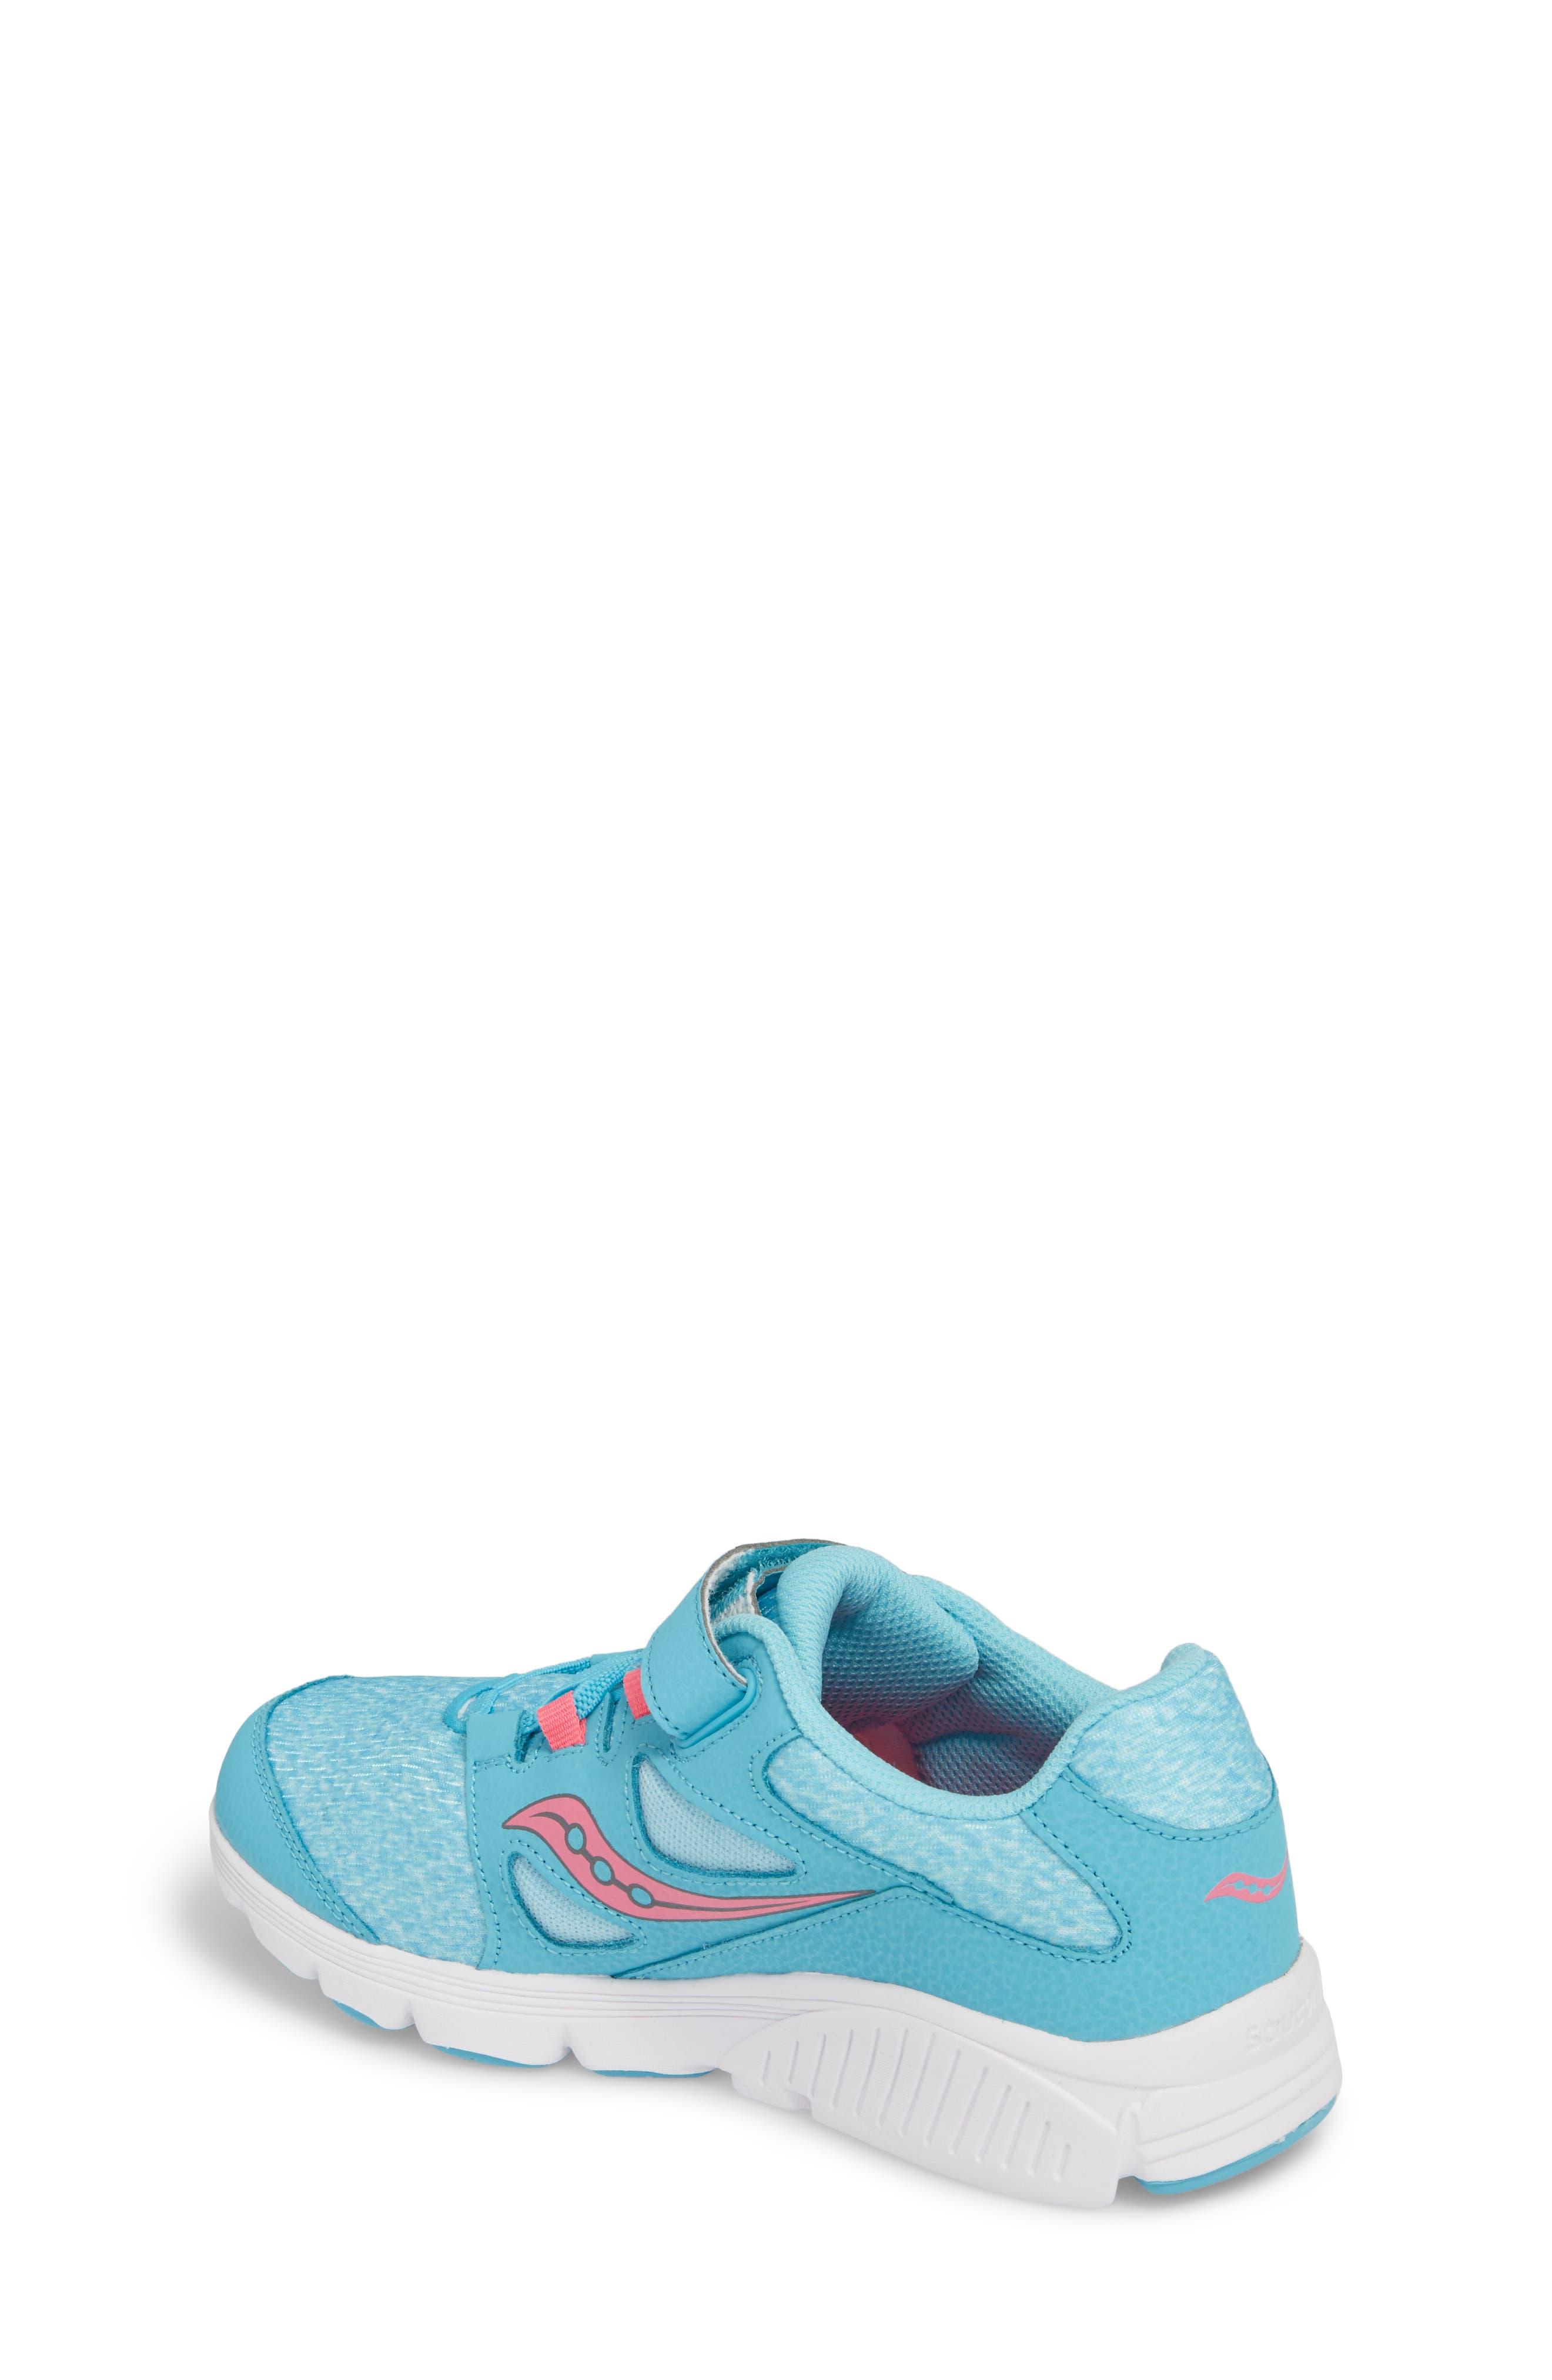 Kotaro 4 Sneaker,                             Alternate thumbnail 2, color,                             Turquoise/ Pink